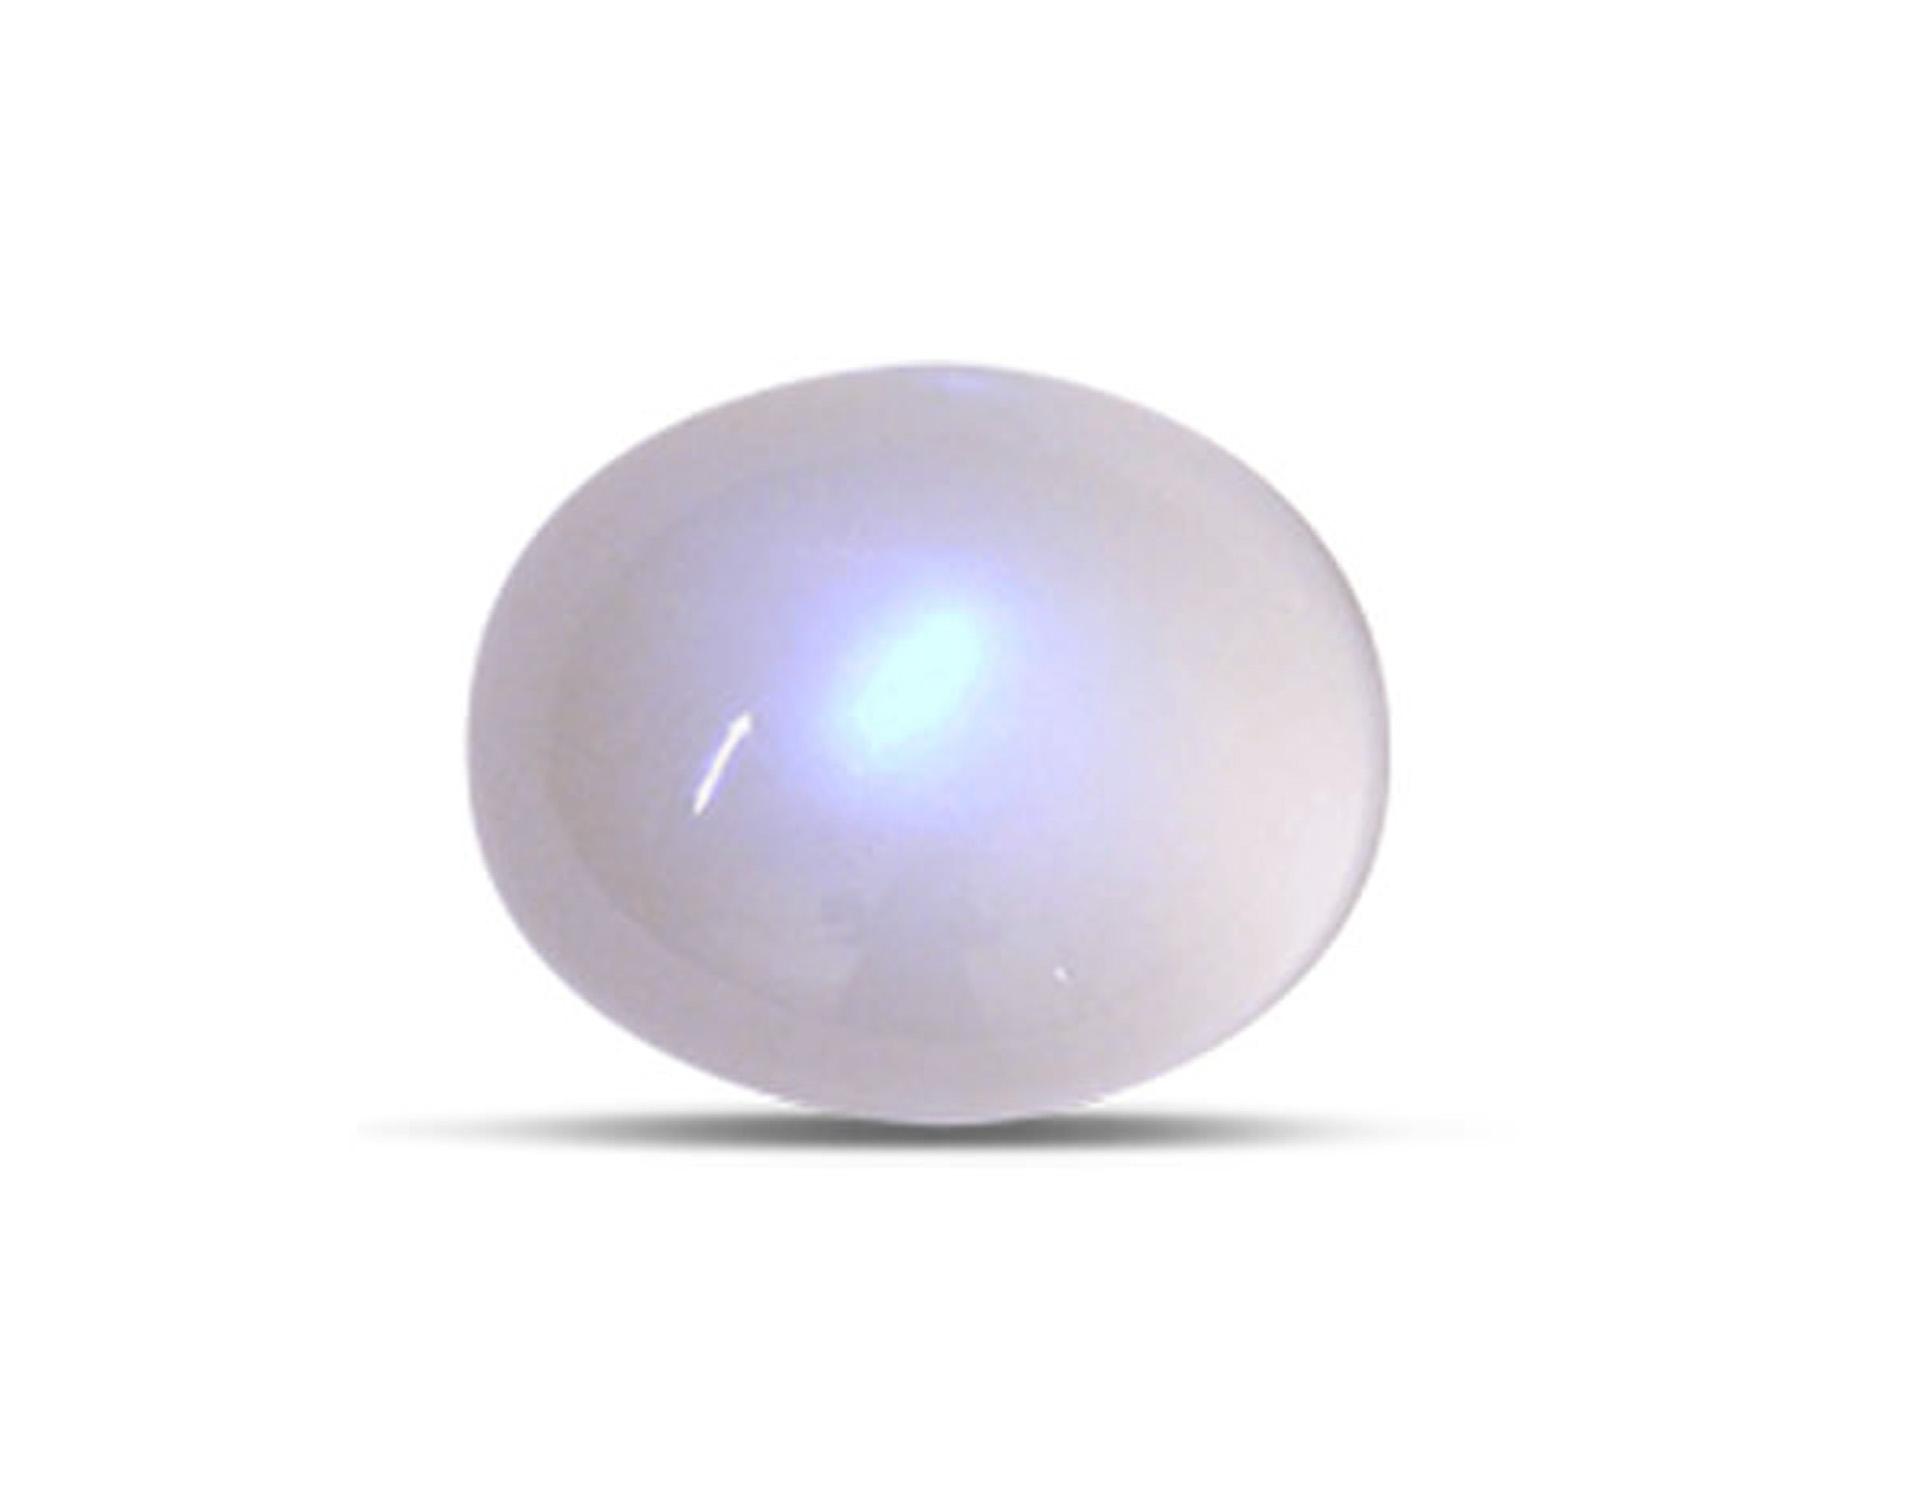 Gemstones Moonstone Catherine Budd Jewellery Bespoke.jpg